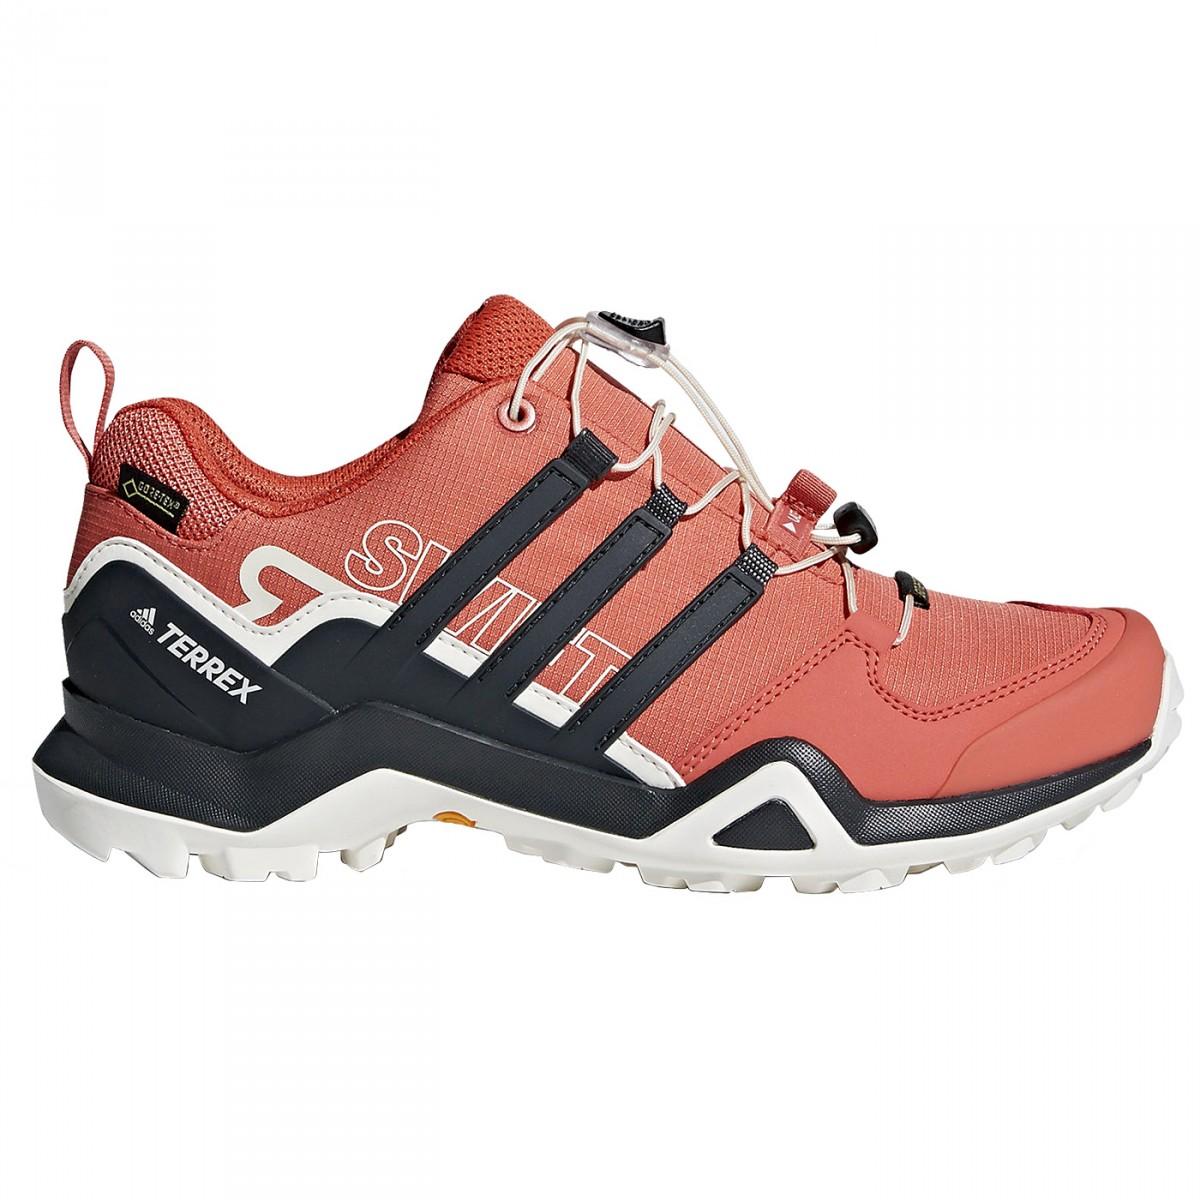 chaussures hiking adidas terrex swift r2 gtx femme chaussures trekking. Black Bedroom Furniture Sets. Home Design Ideas